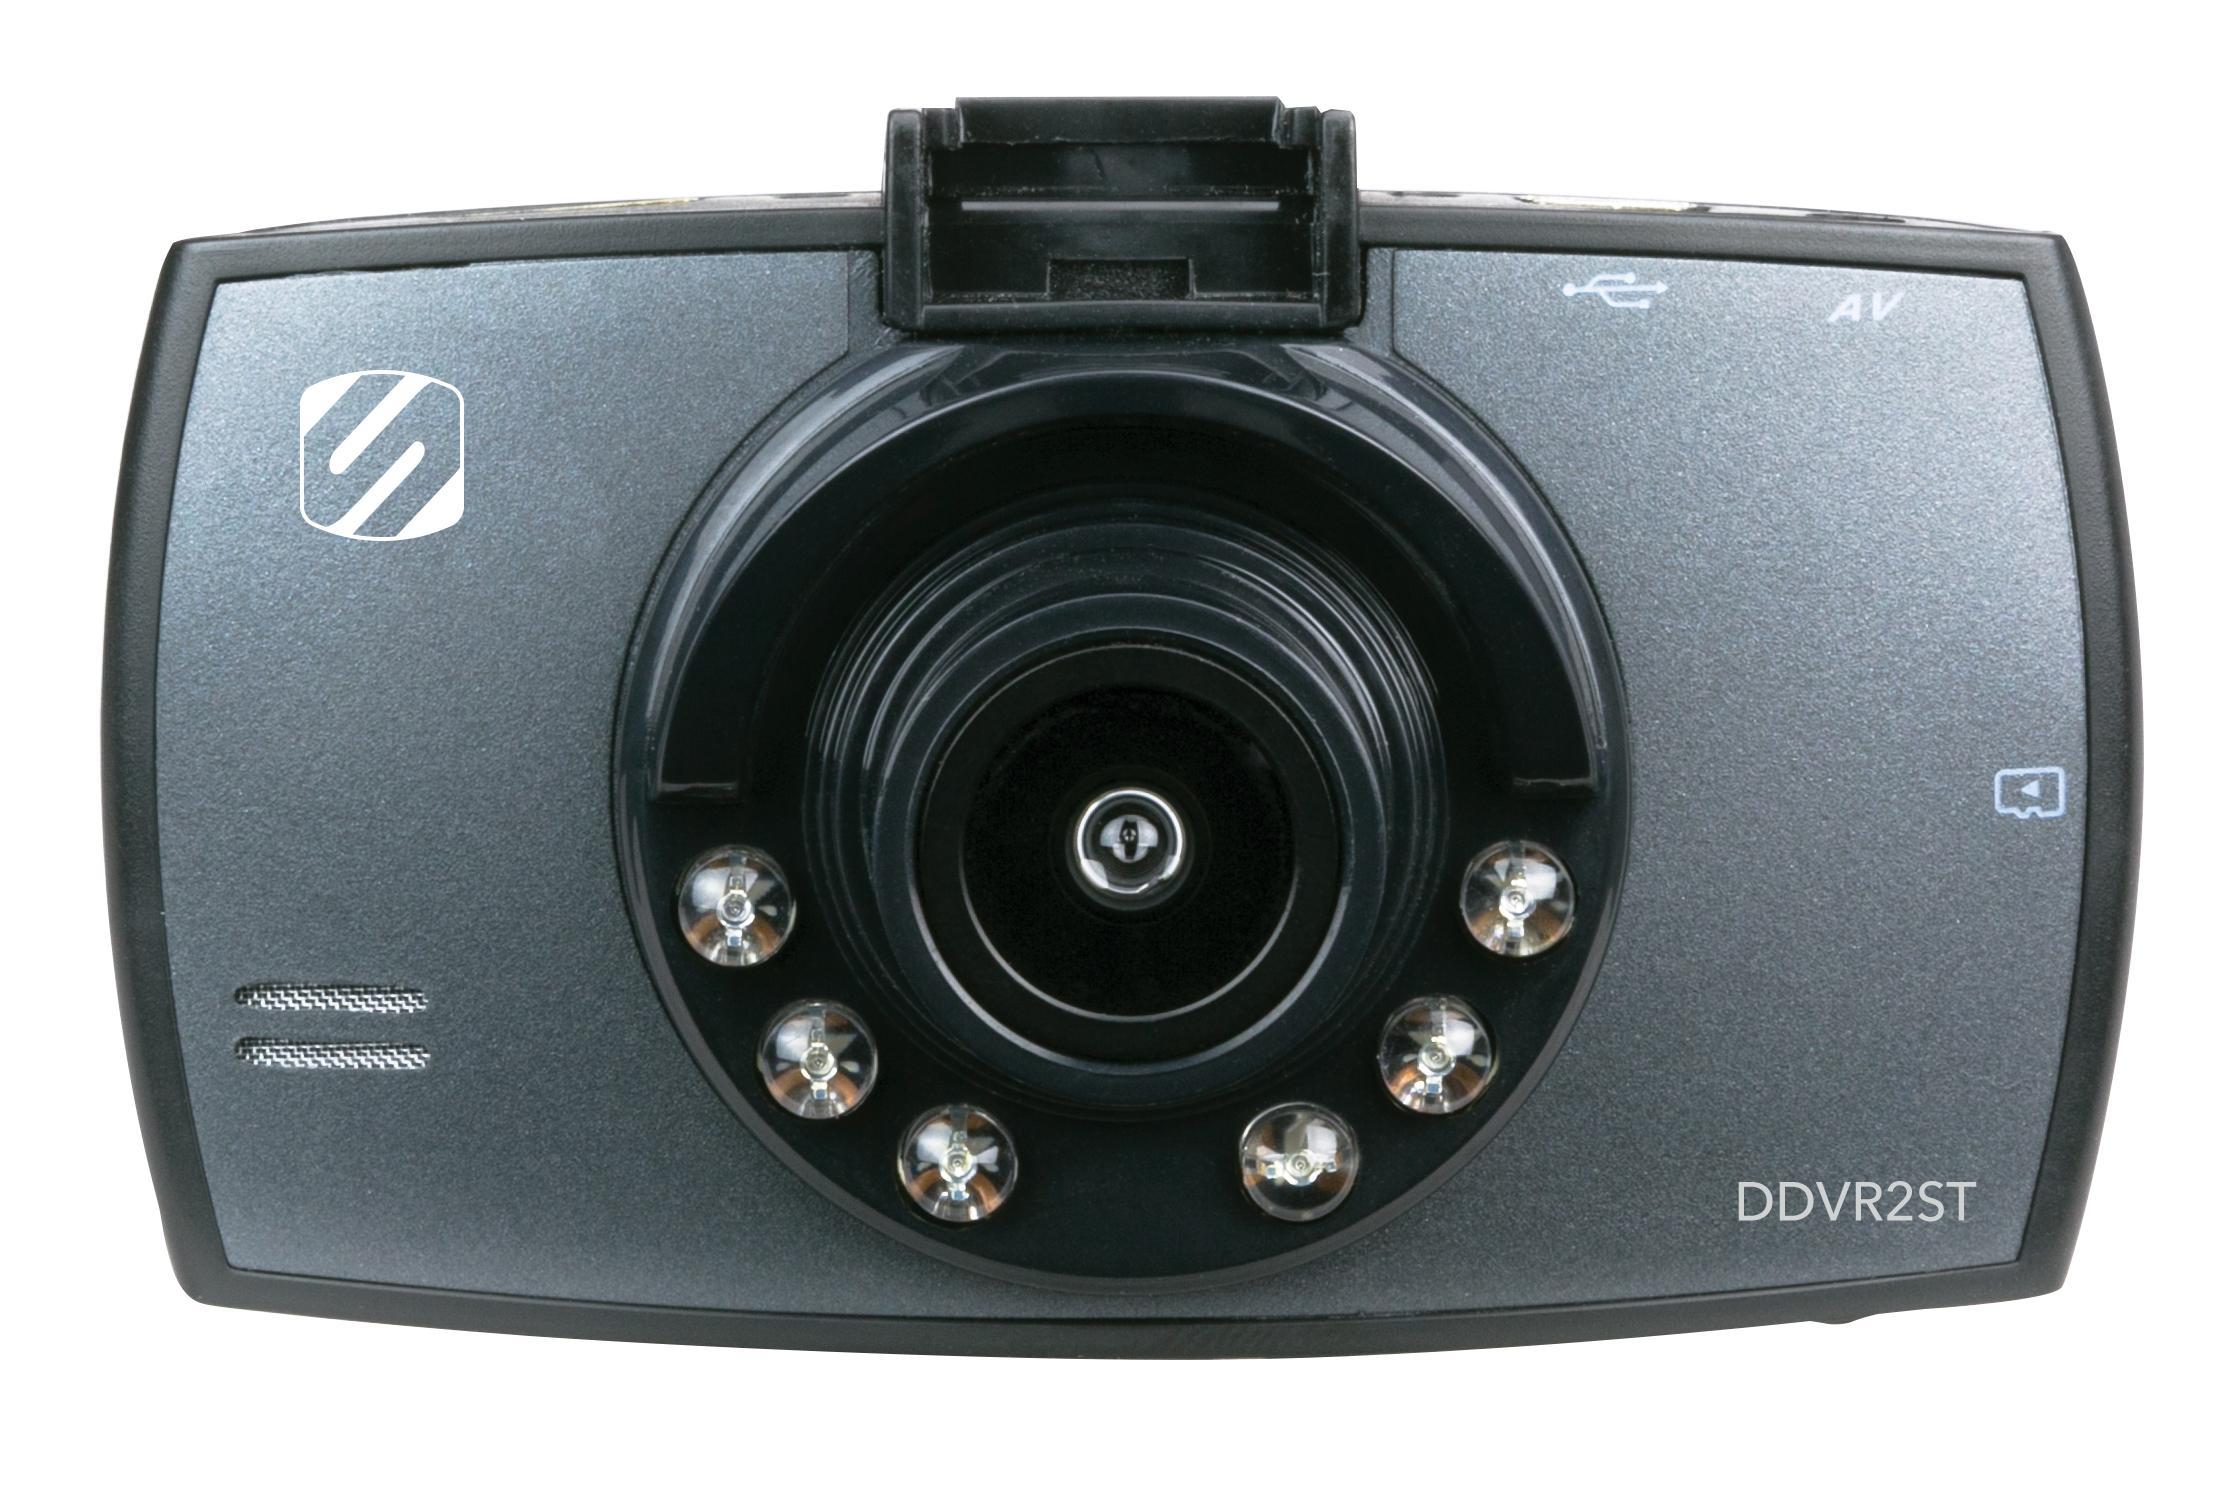 Caméra de bord 7843 SCOSCHE 7843 originales de qualité